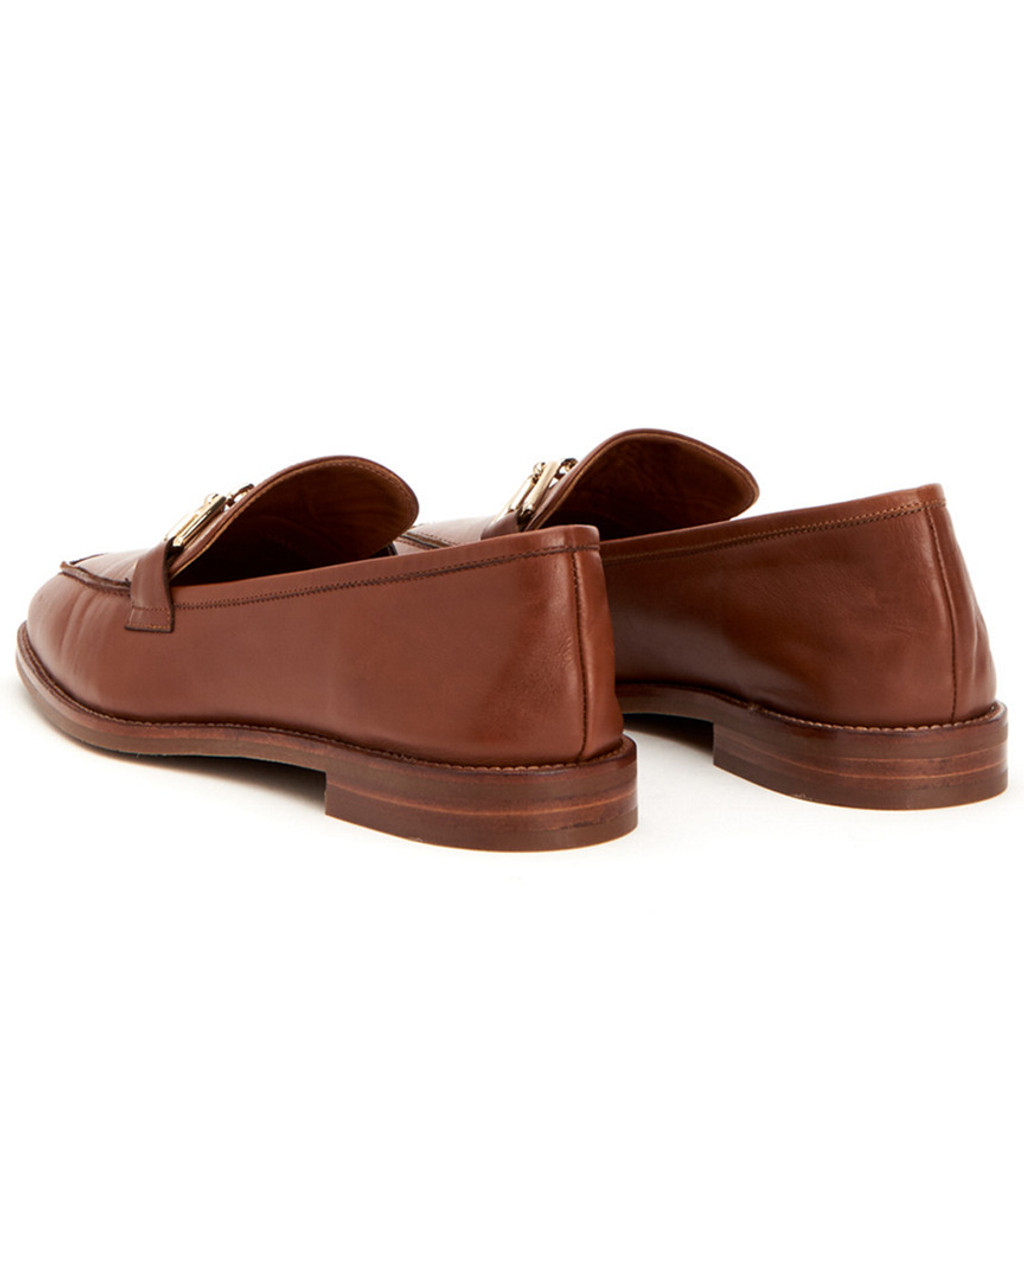 eb2a4ba95df Aquatalia Teodora Waterproof Leather Loafer~1311750928 - Carsons